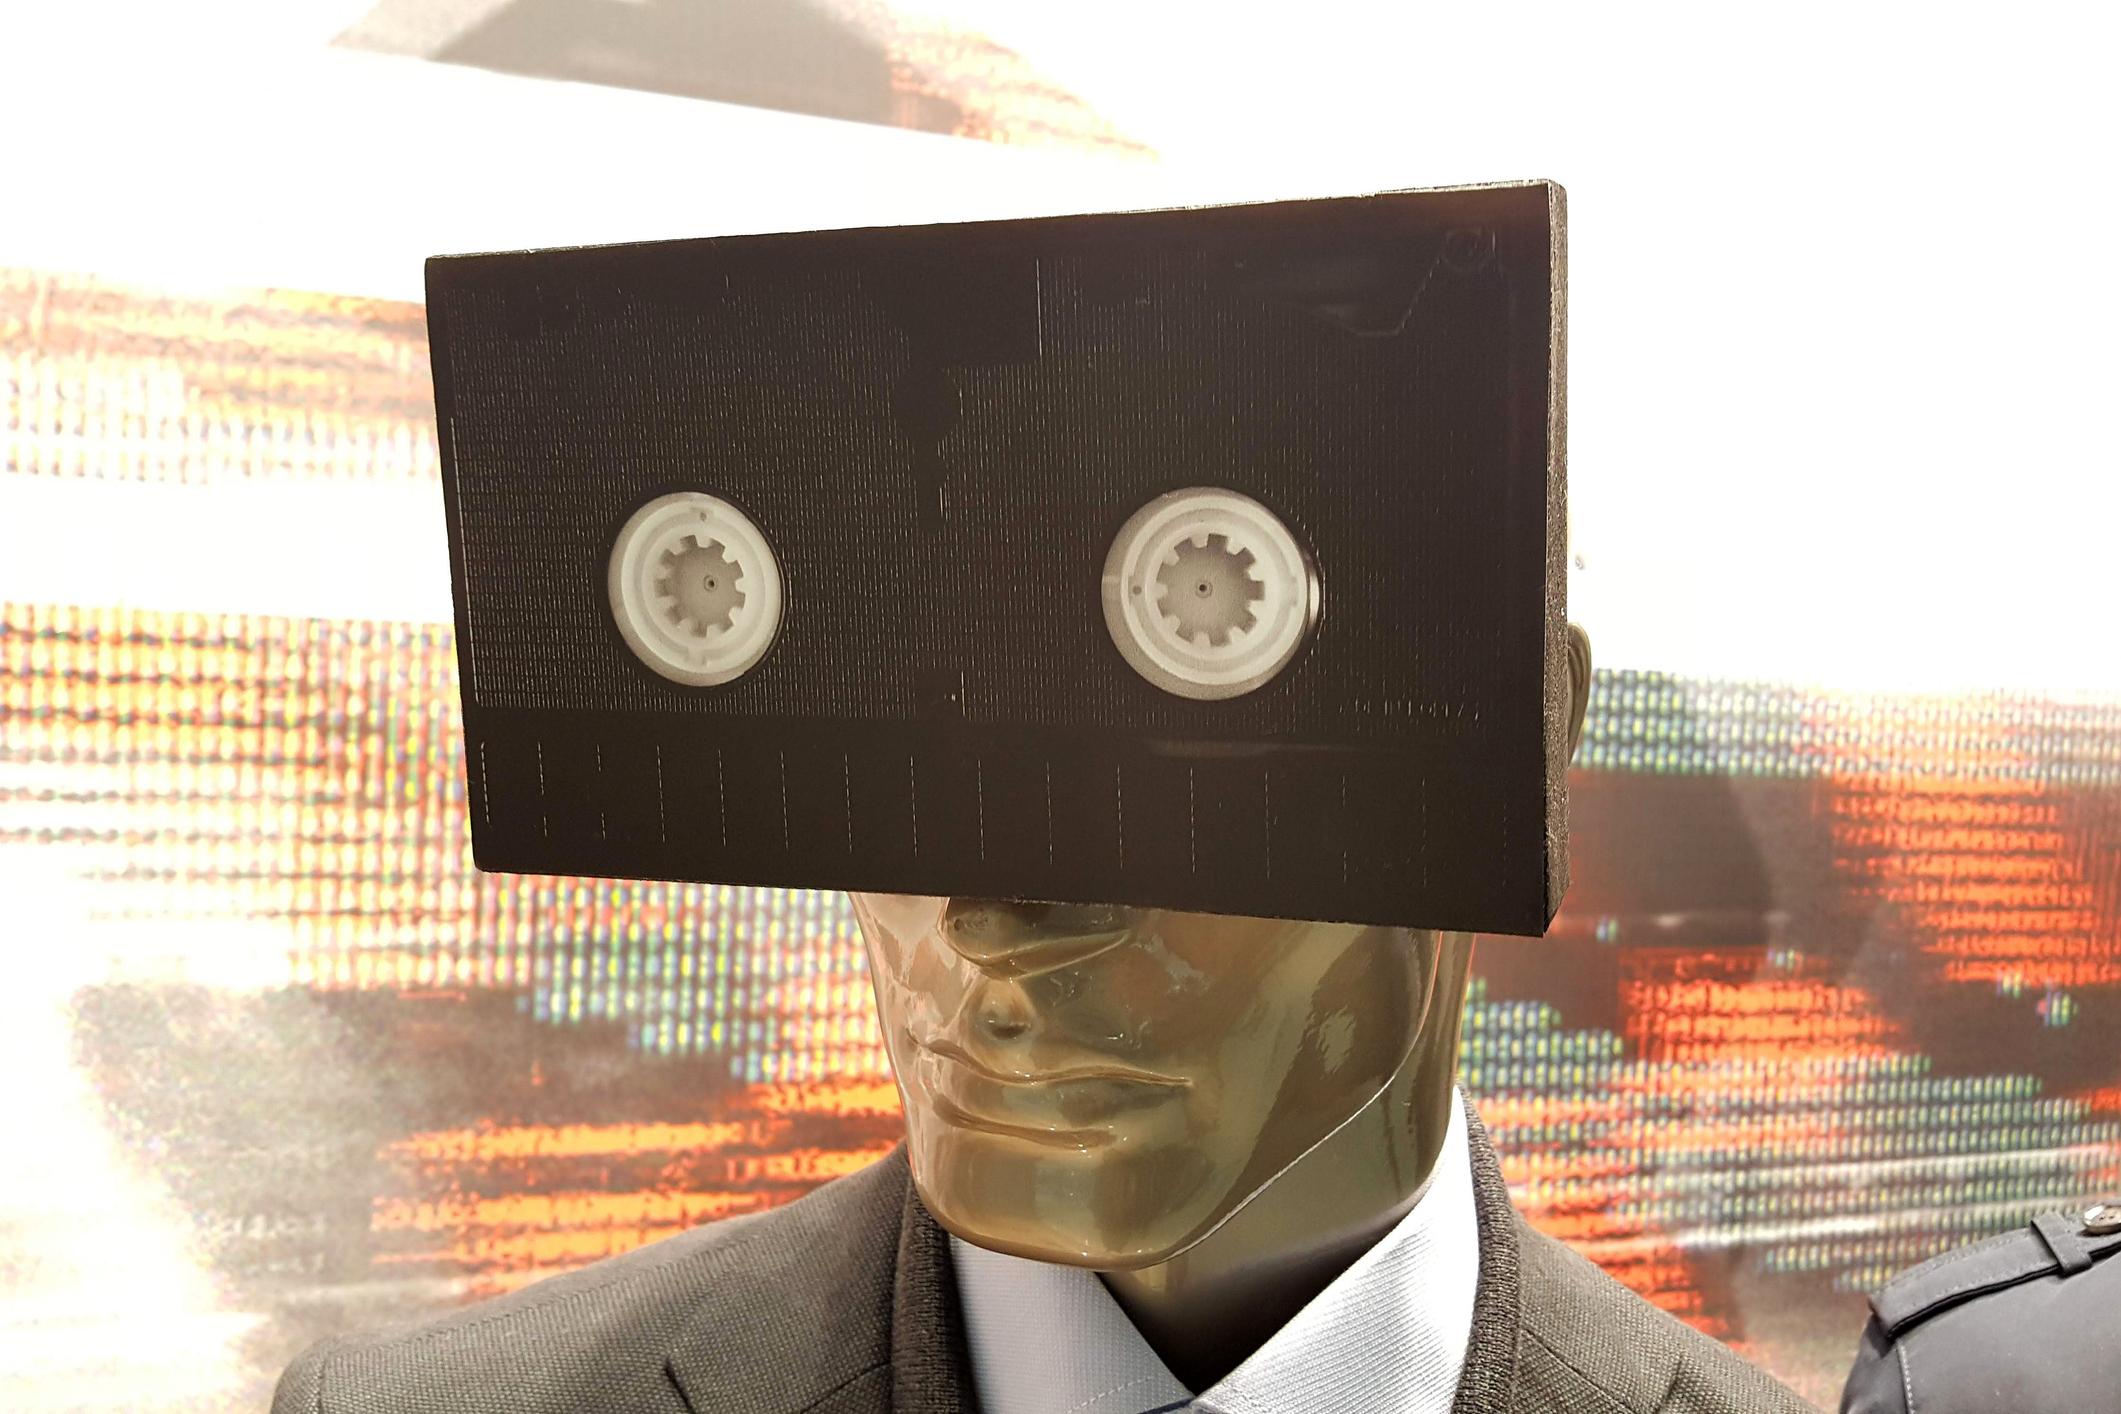 Analog Digital Video Converter